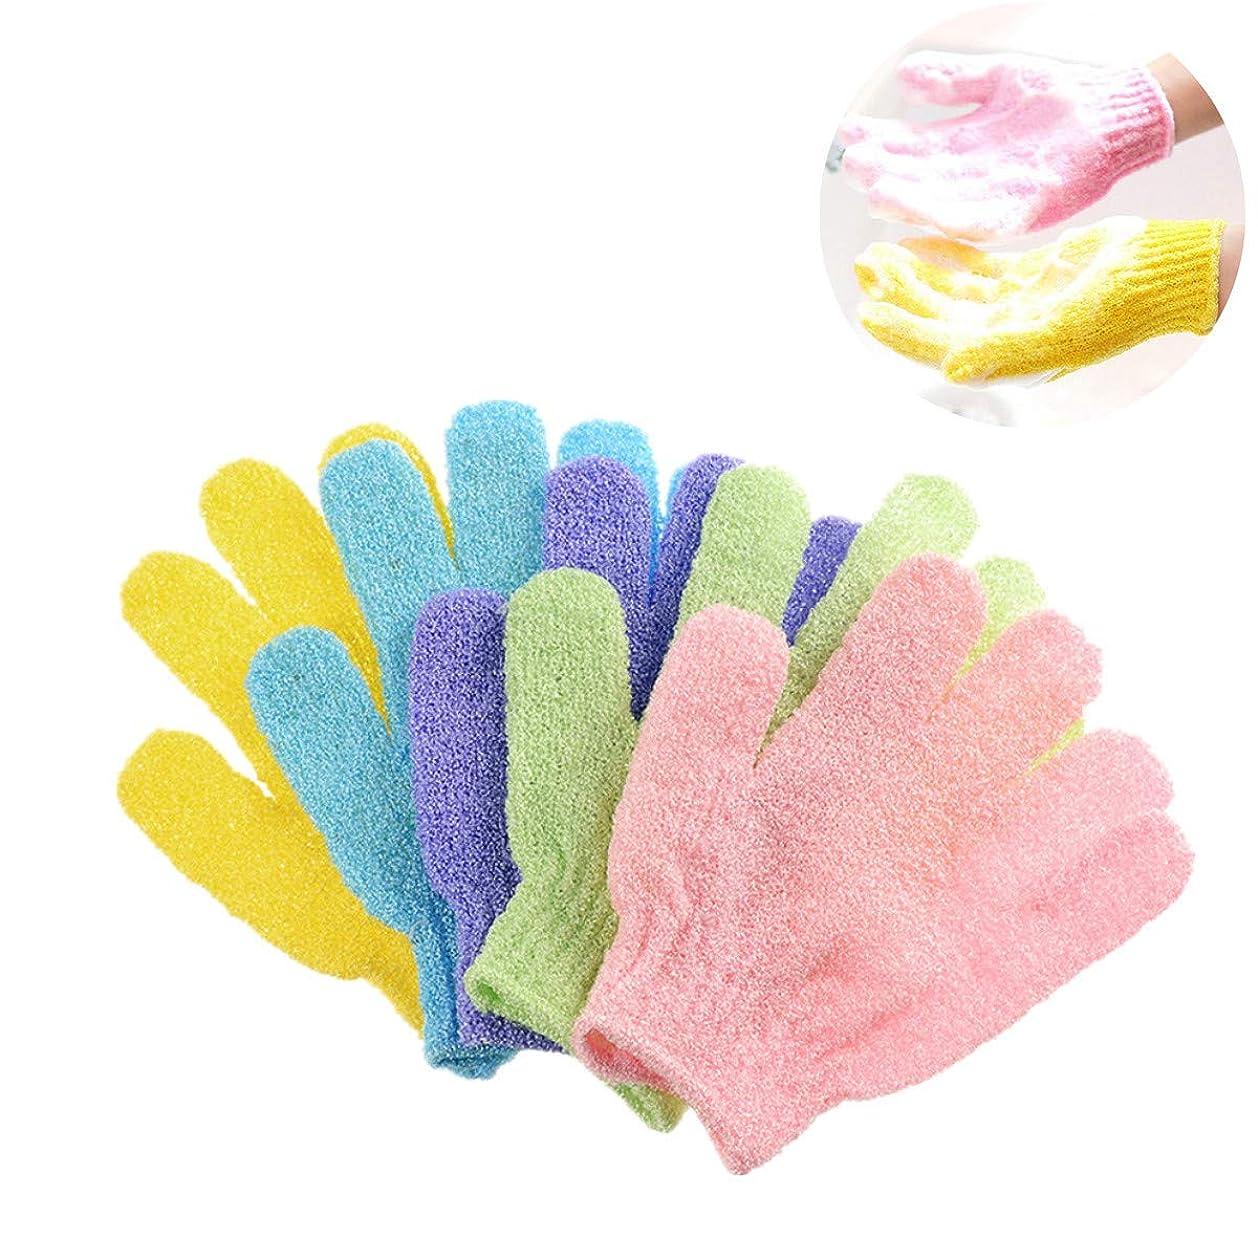 Kingsie 浴用手袋 10枚セット(5ペア) ボディウォッシュ手袋 お風呂手袋 角質除去 角質取り 泡立ち 垢すり グローブ